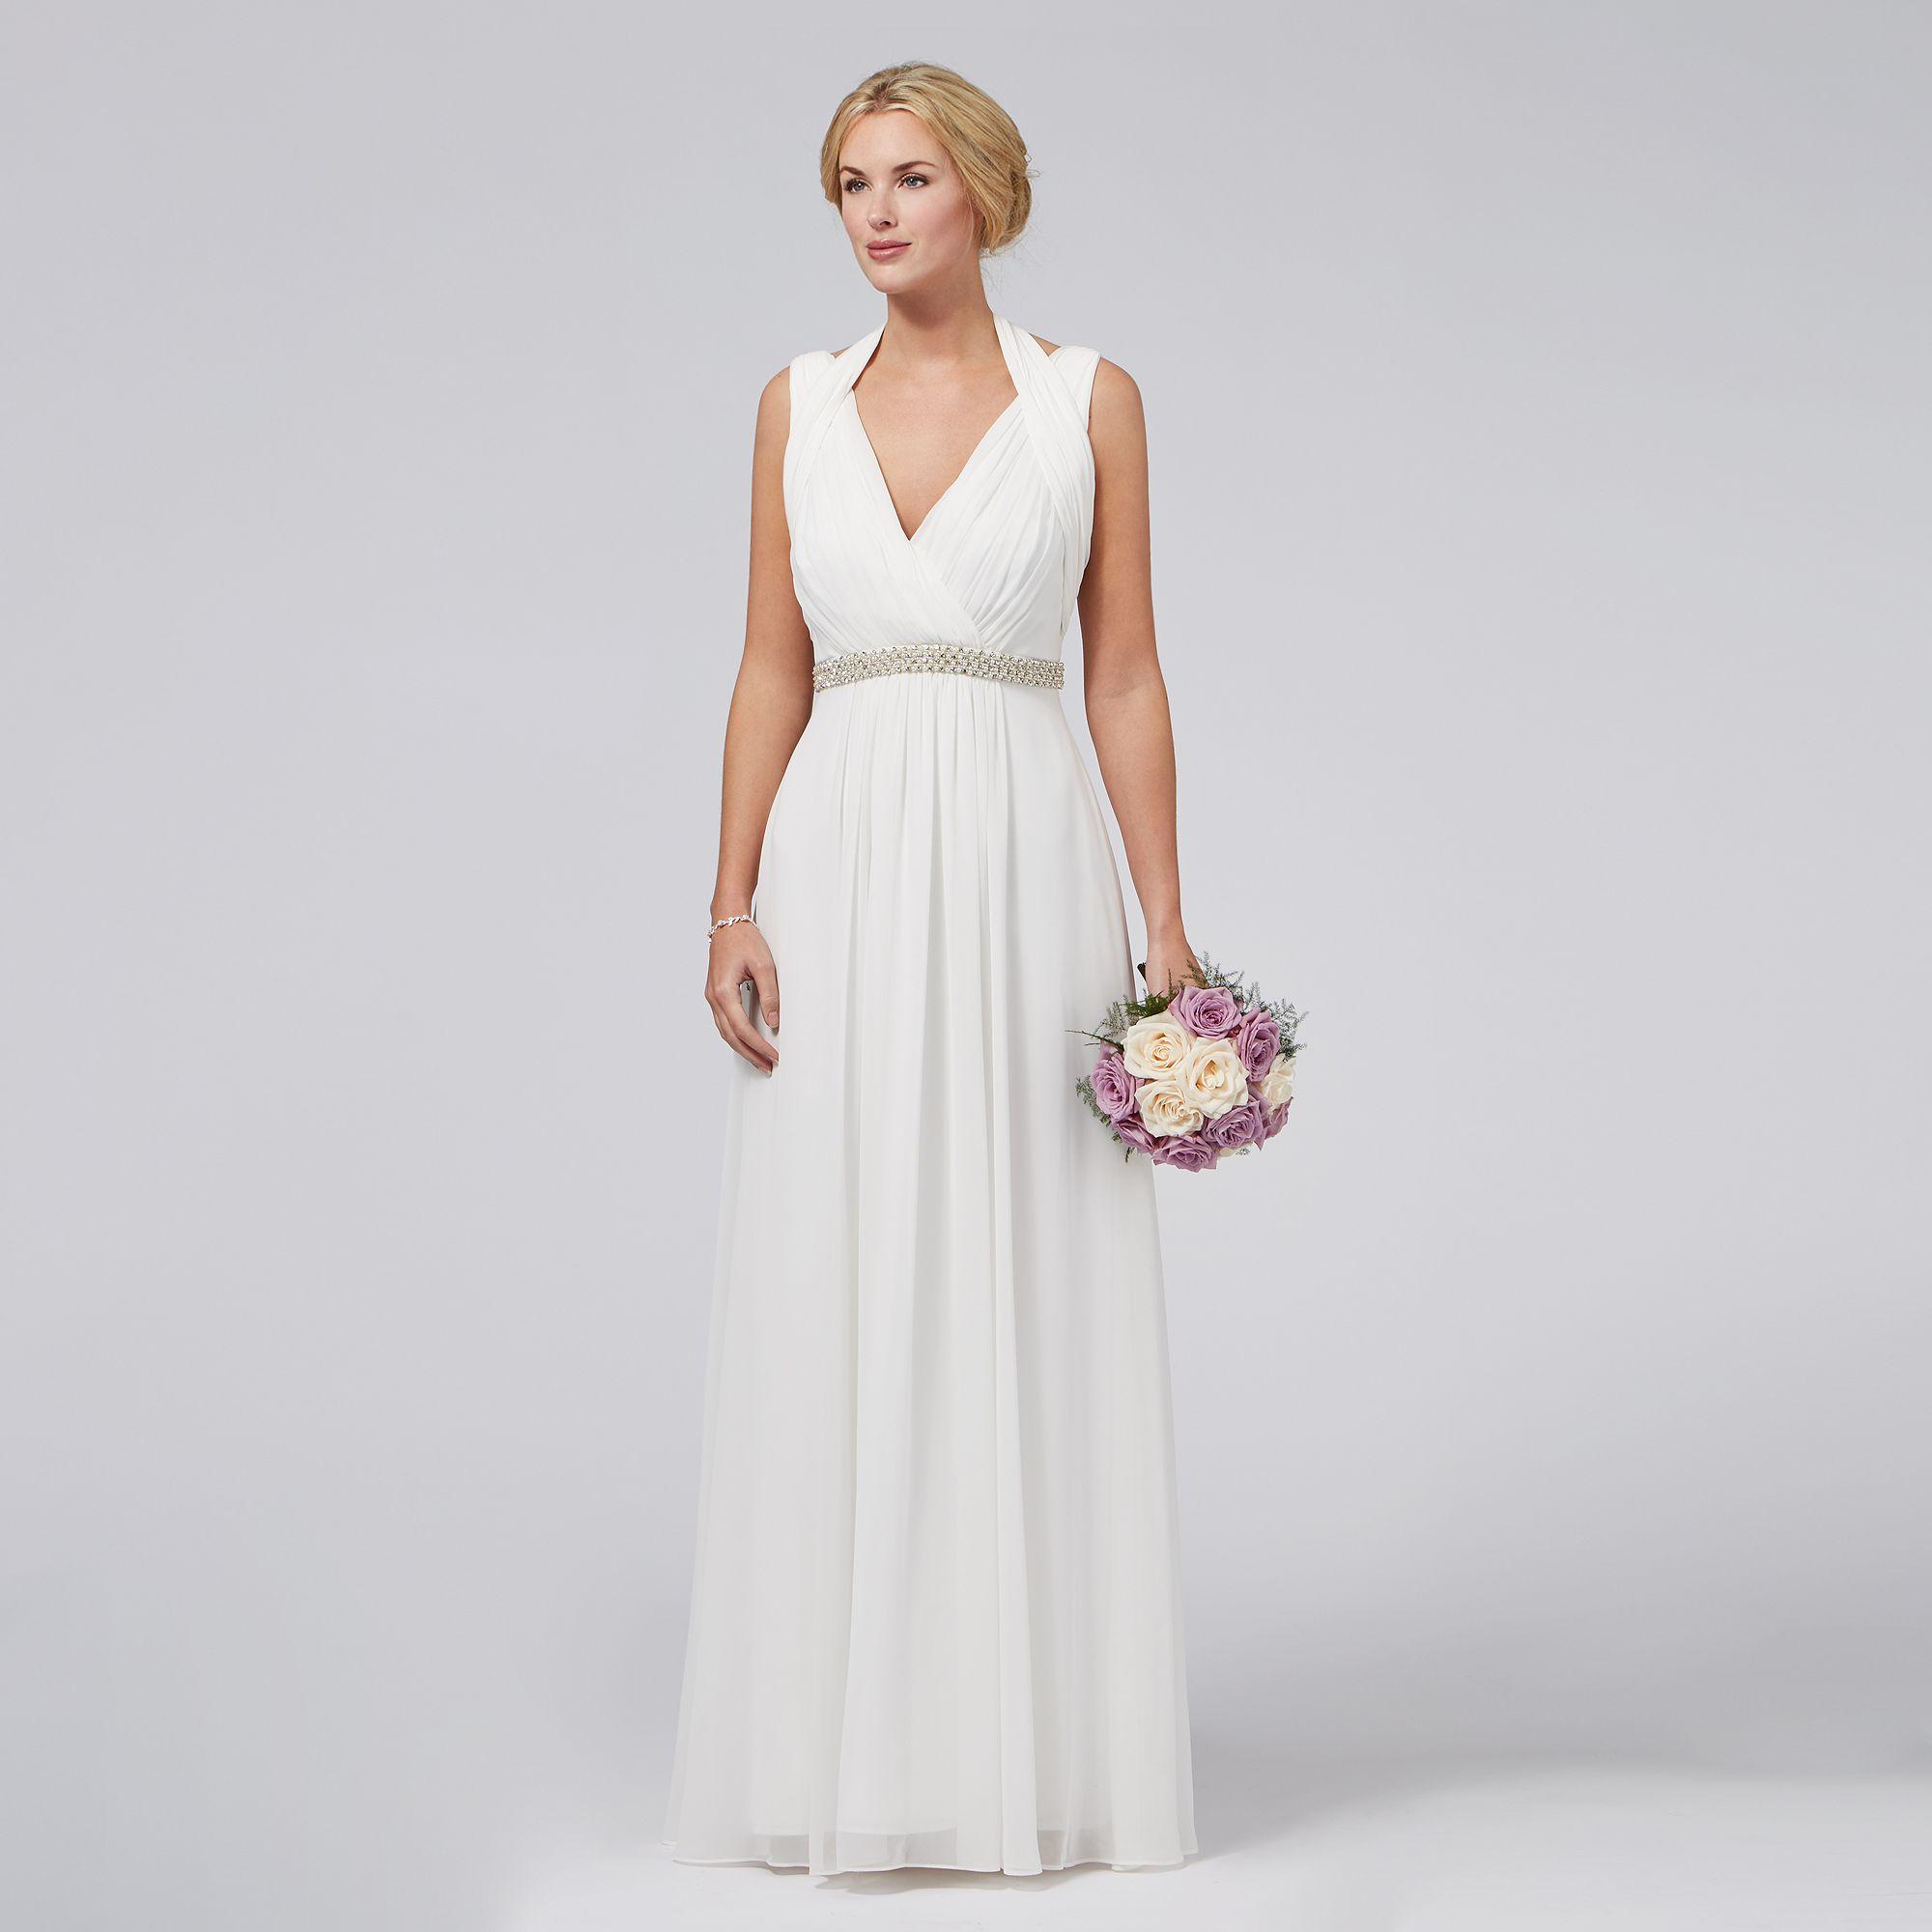 Debut Womens Ivory 39 Ava 39 V Neck Wedding Dress From